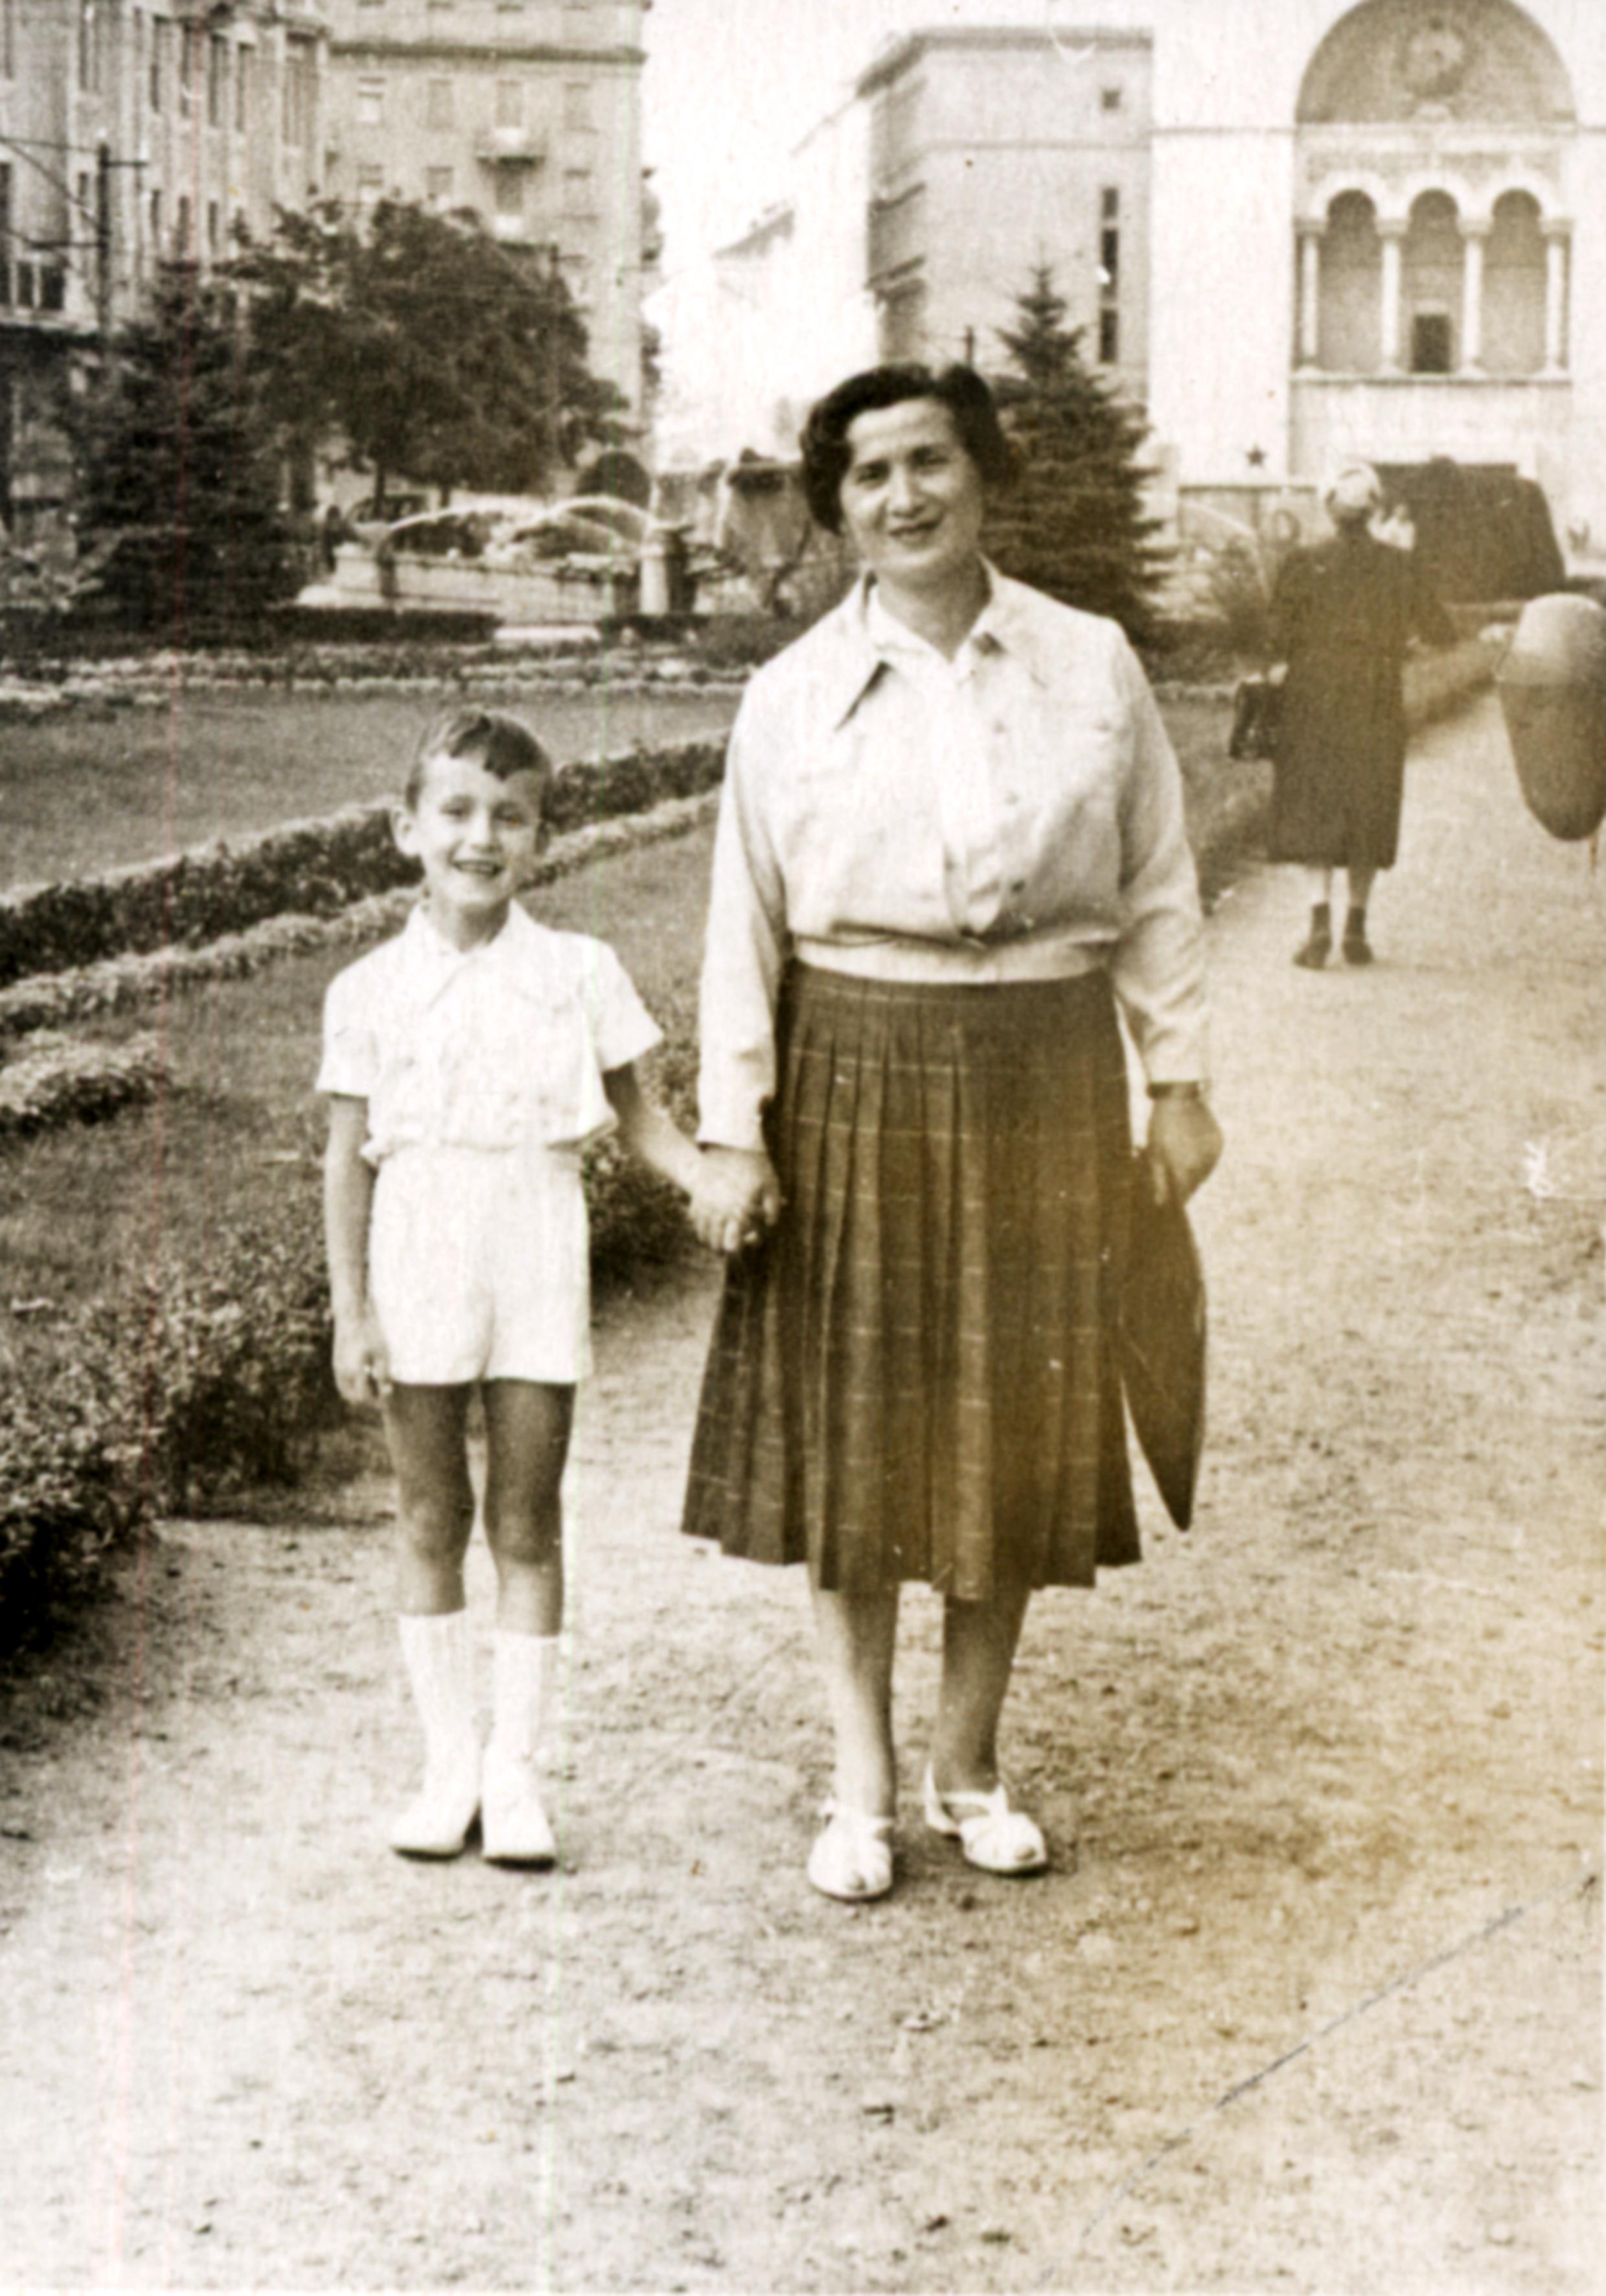 Francisc Illes and Olga Jakobovics